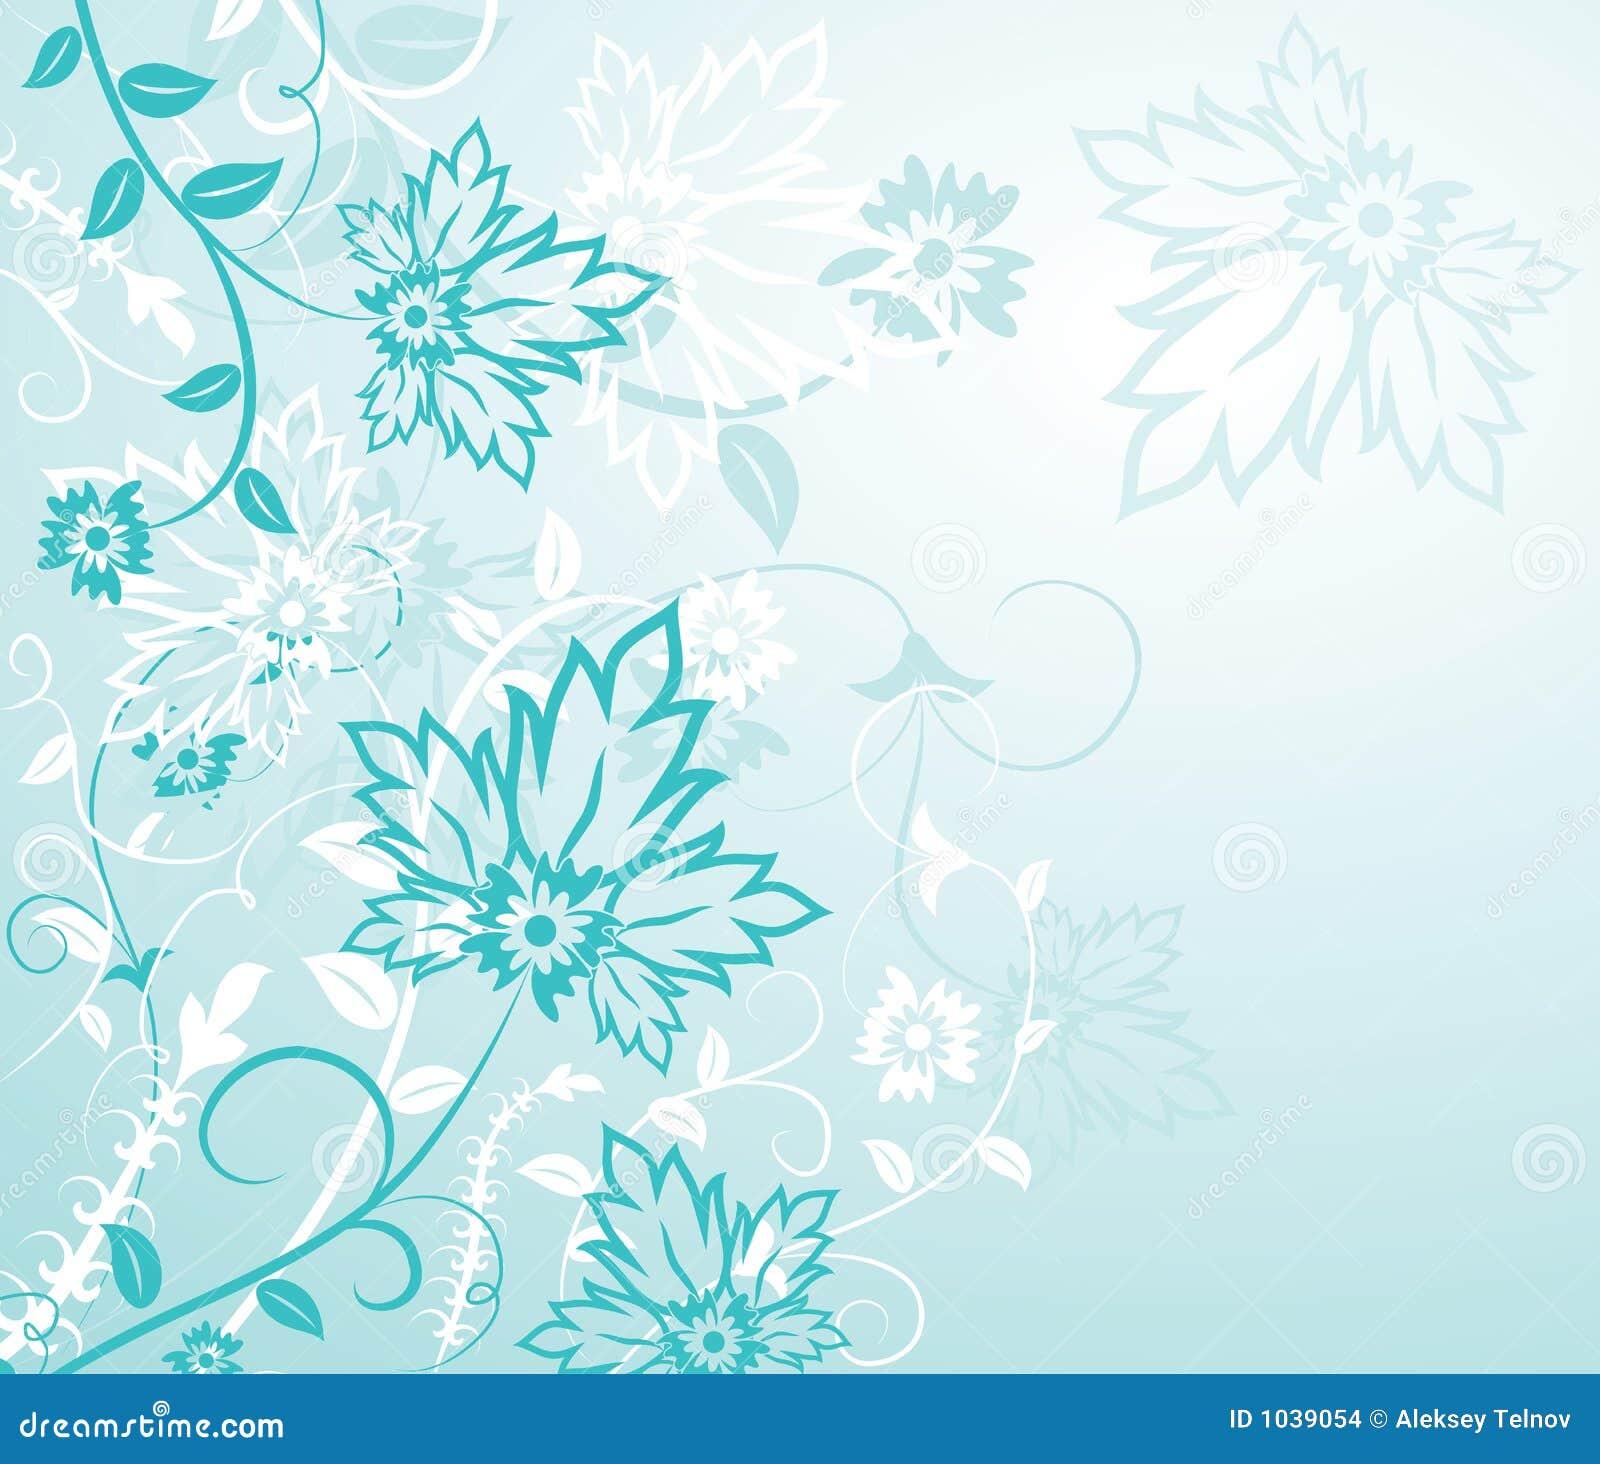 Background Flower Elements For Design Vector Stock